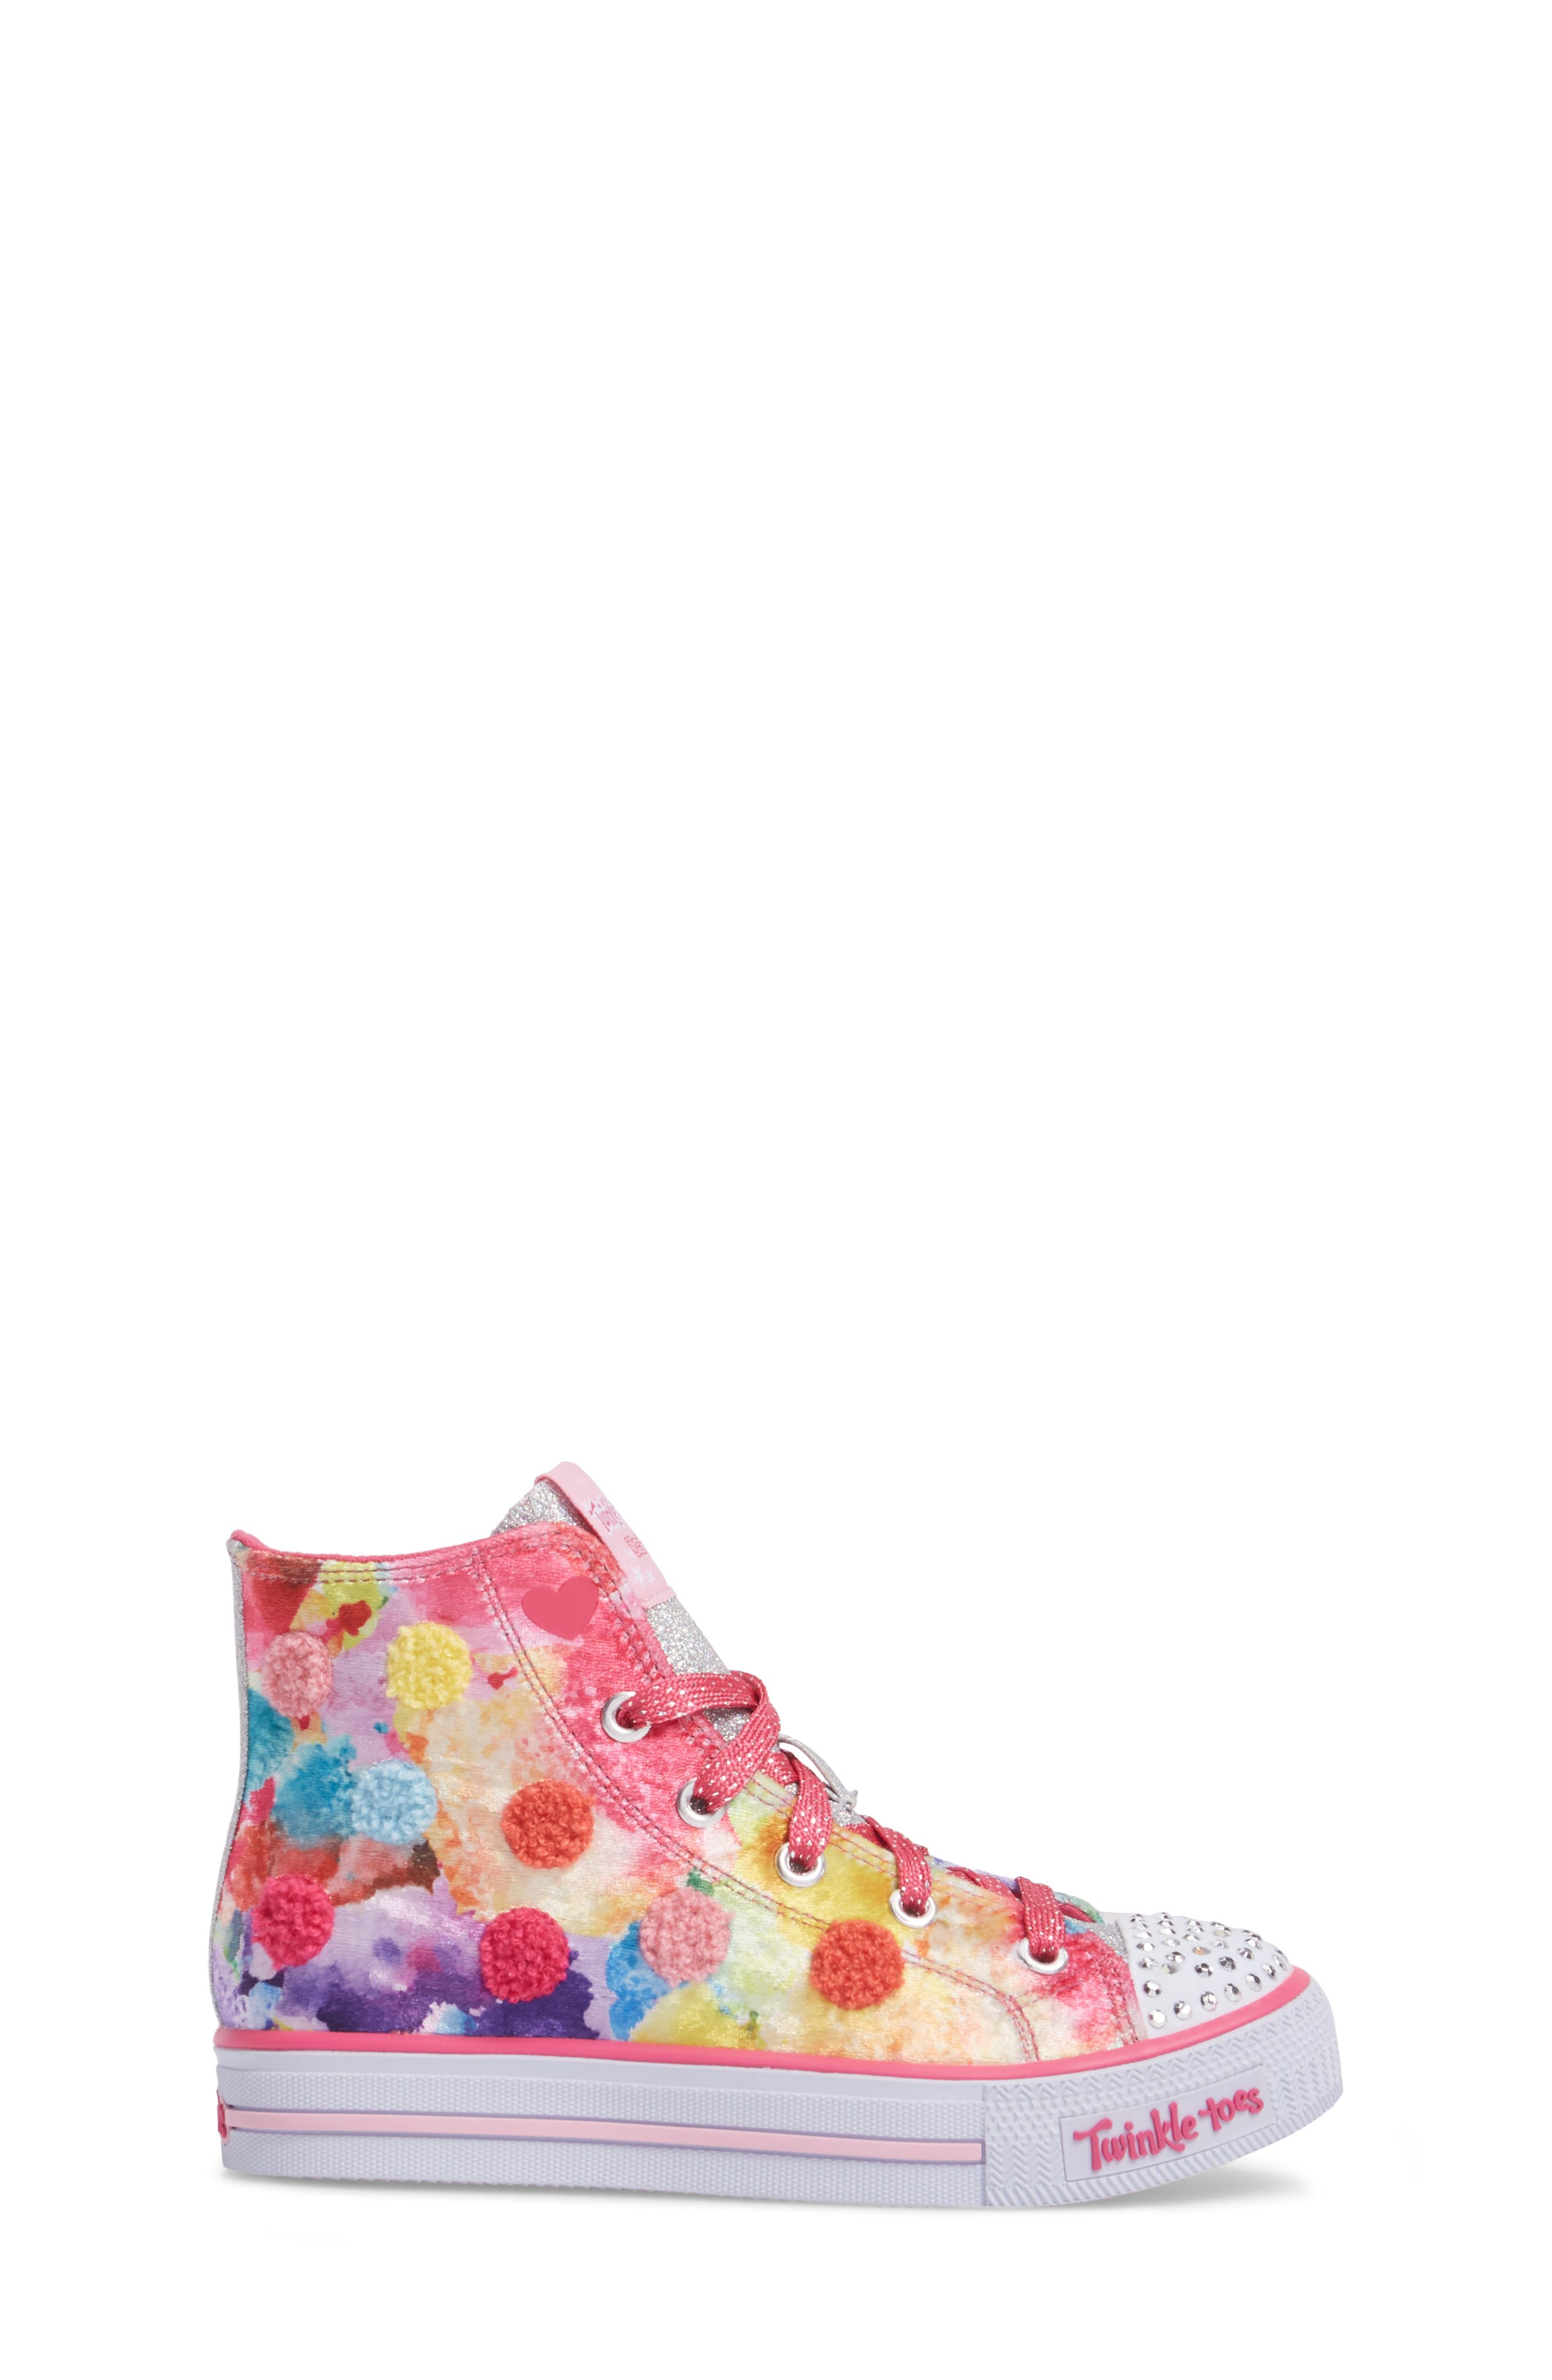 SKECHERS,                             Twinkle Toes Shuffles Light-Up High Top Sneaker,                             Alternate thumbnail 3, color,                             650